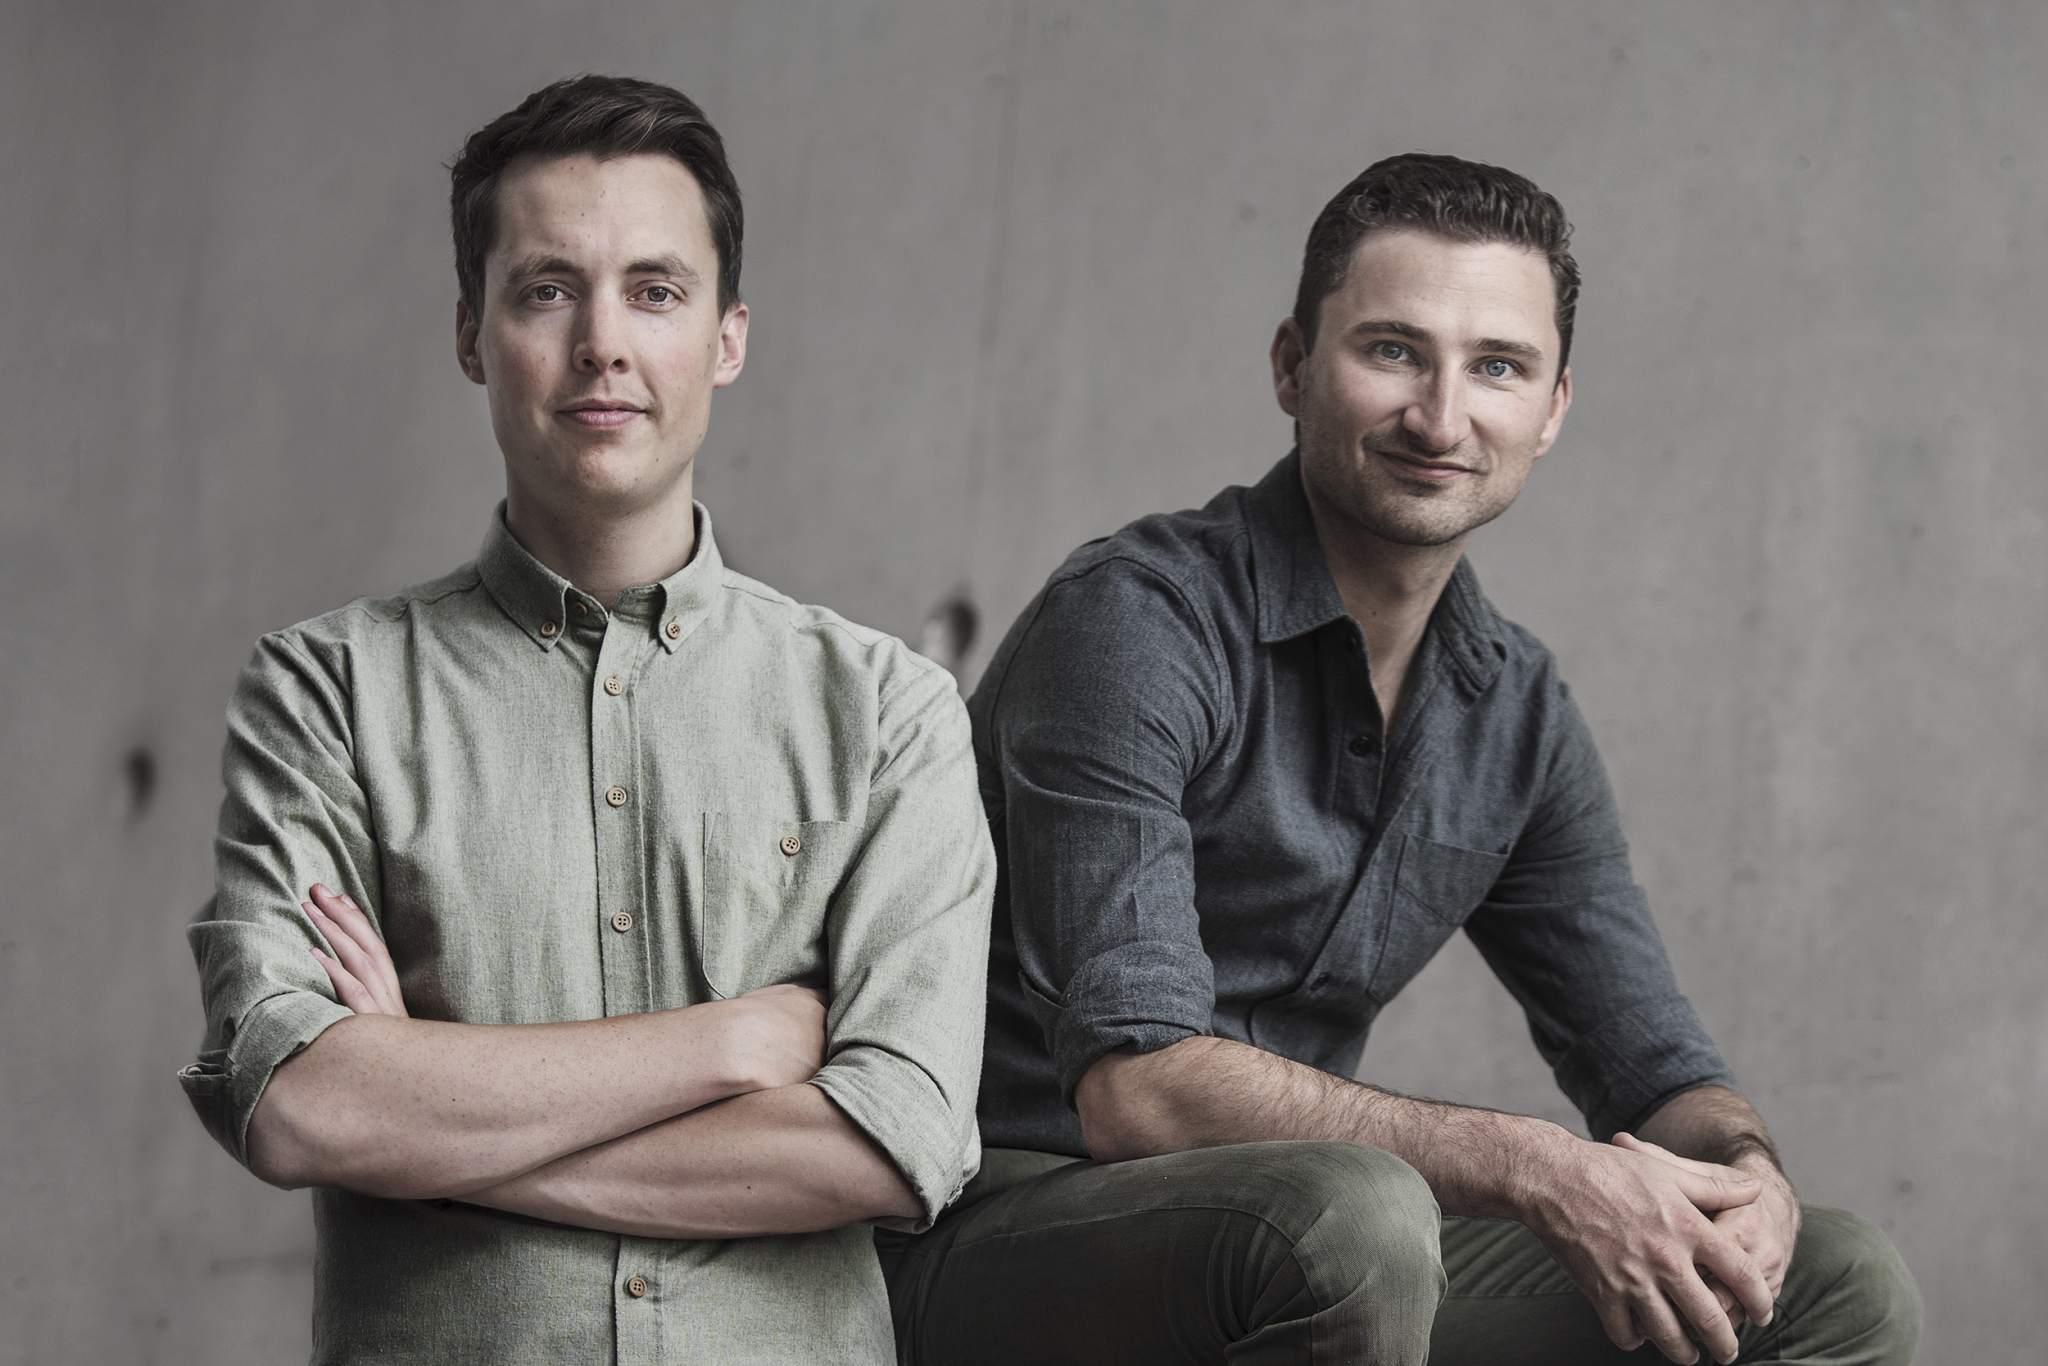 3D Hubs founders BrianGarret (left) and BramdeZwart (right). Photo via 3D Hubs.